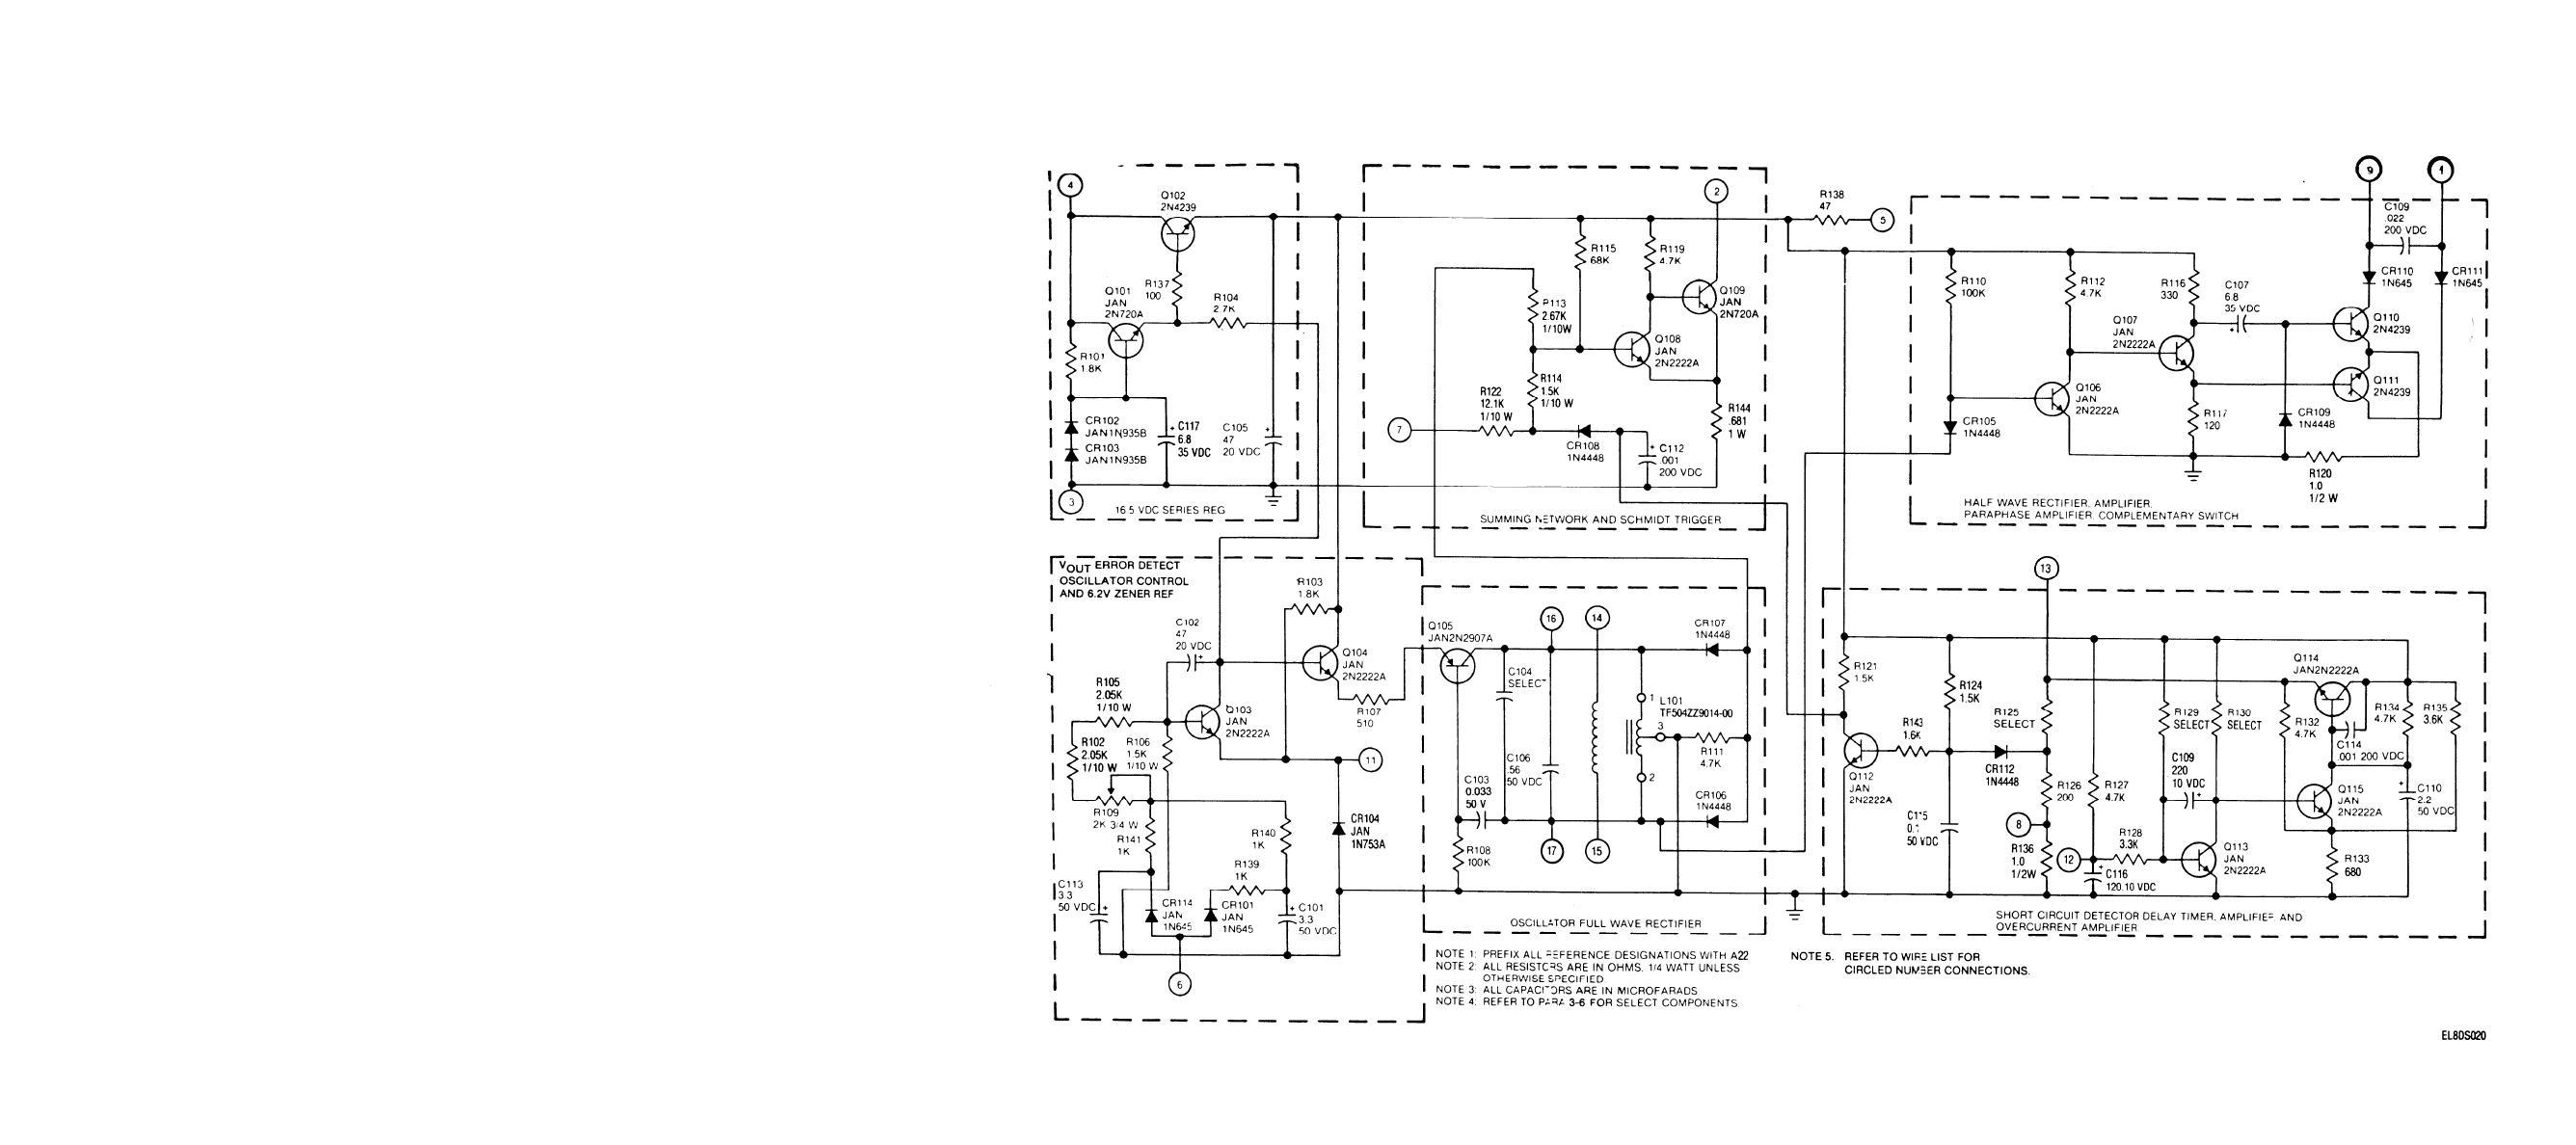 Inverter Schematic Diagram 12vdc 220vac Hp Photosmart Printer 3 Phase Block